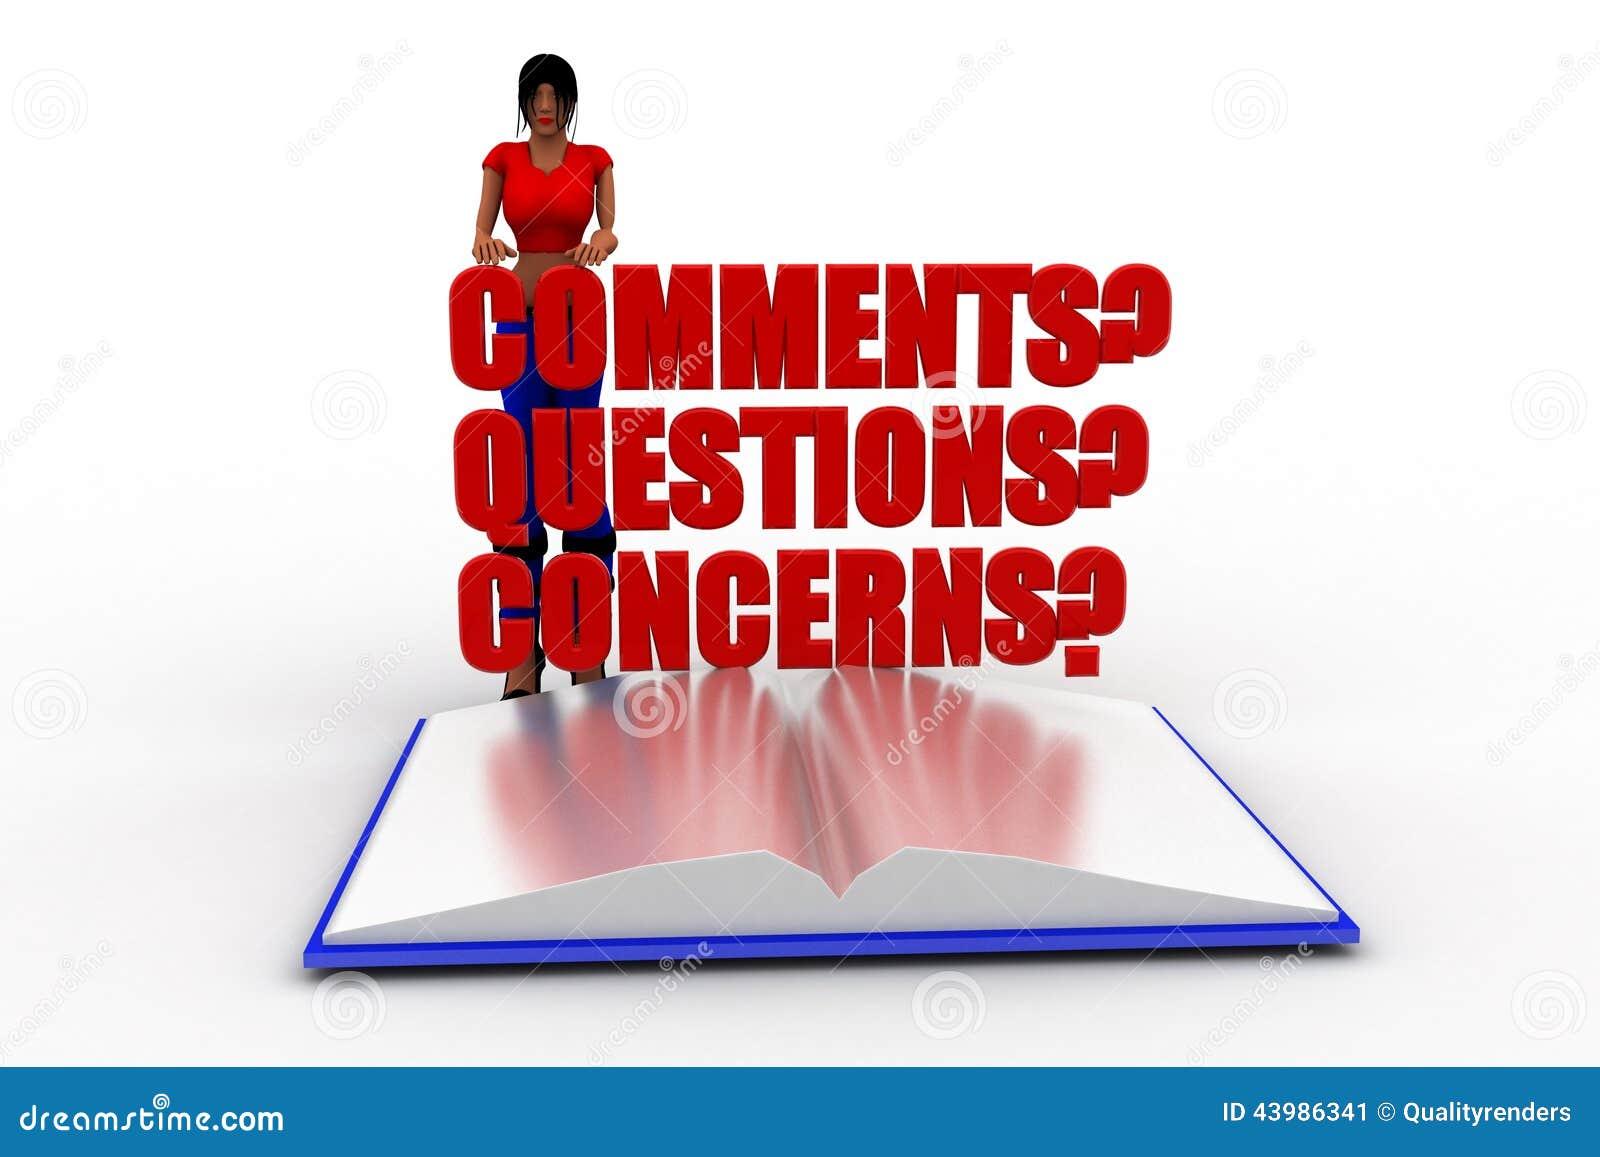 Stock image 3d women comments questions concerns image for Images comment pics